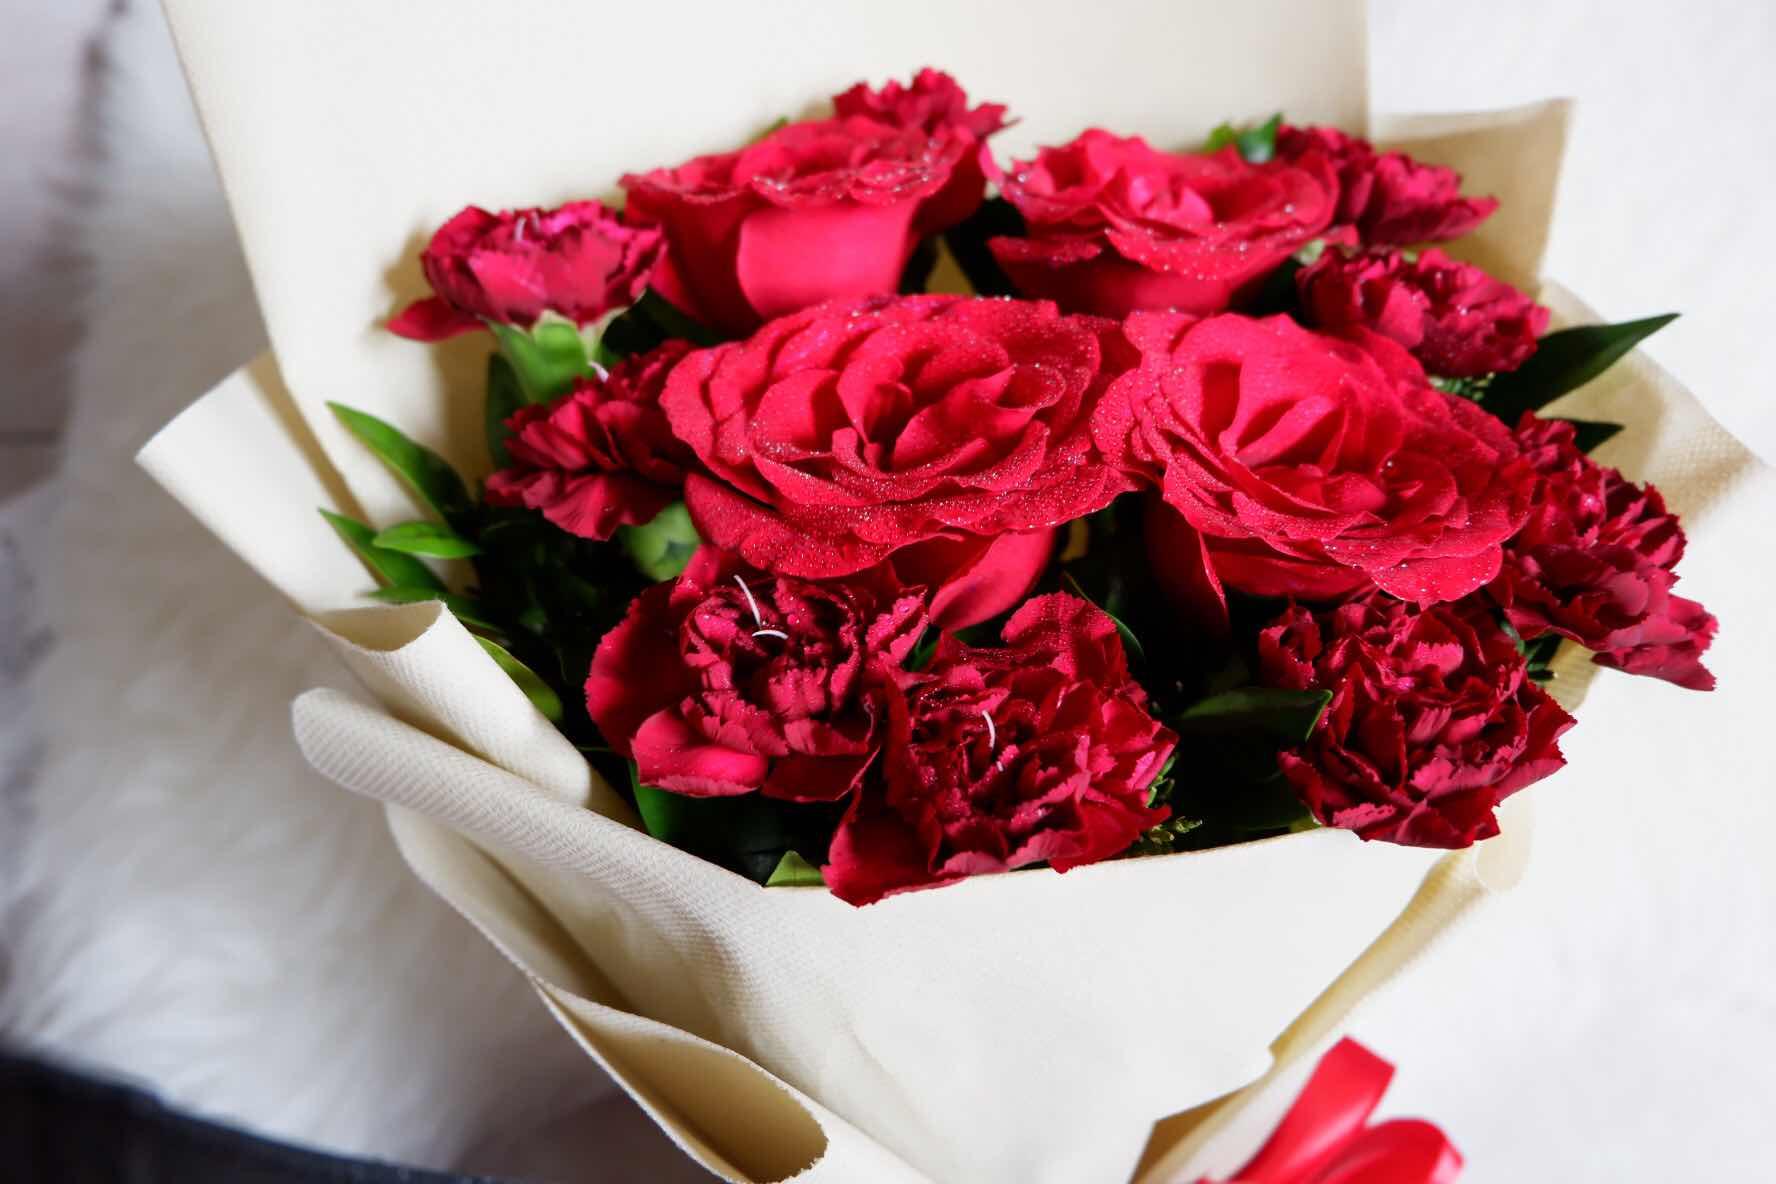 Inilah Cara Pilih Bunga yang Pas untuk Tiap Acara